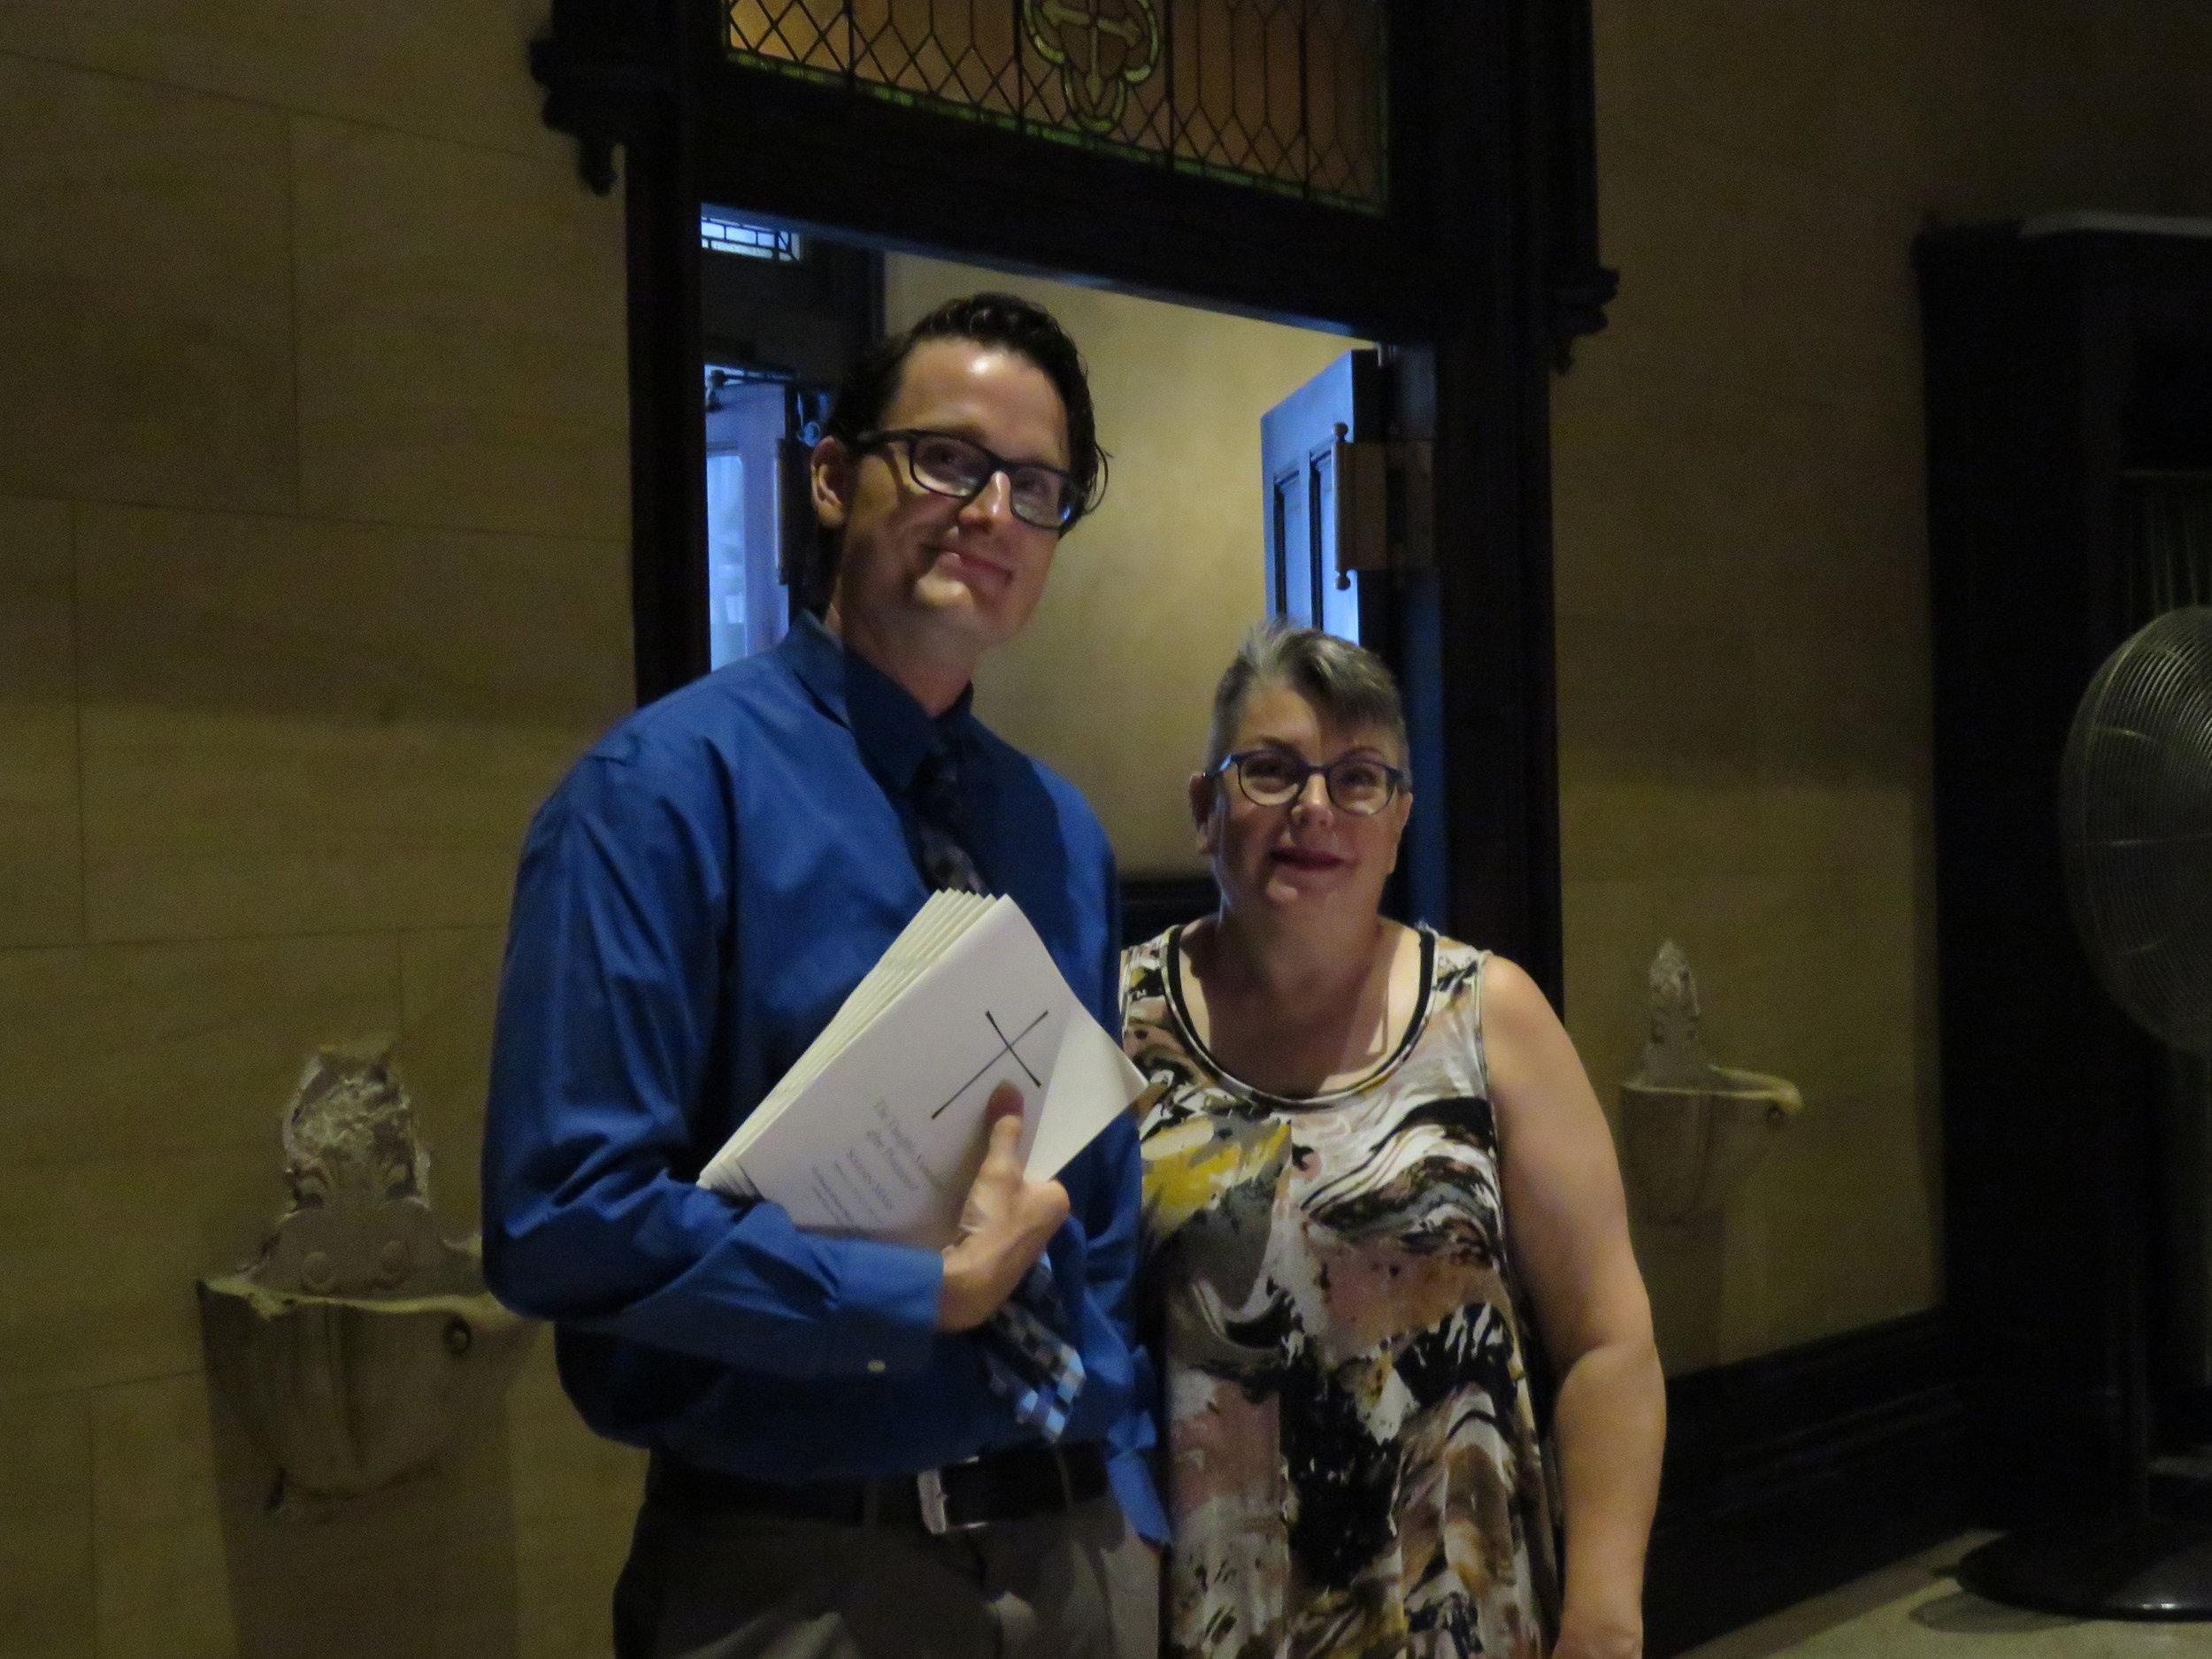 Jason Mudd and Mary Robison were part of the usher team on Sunday.  Photo:  Damien Joseph SSF